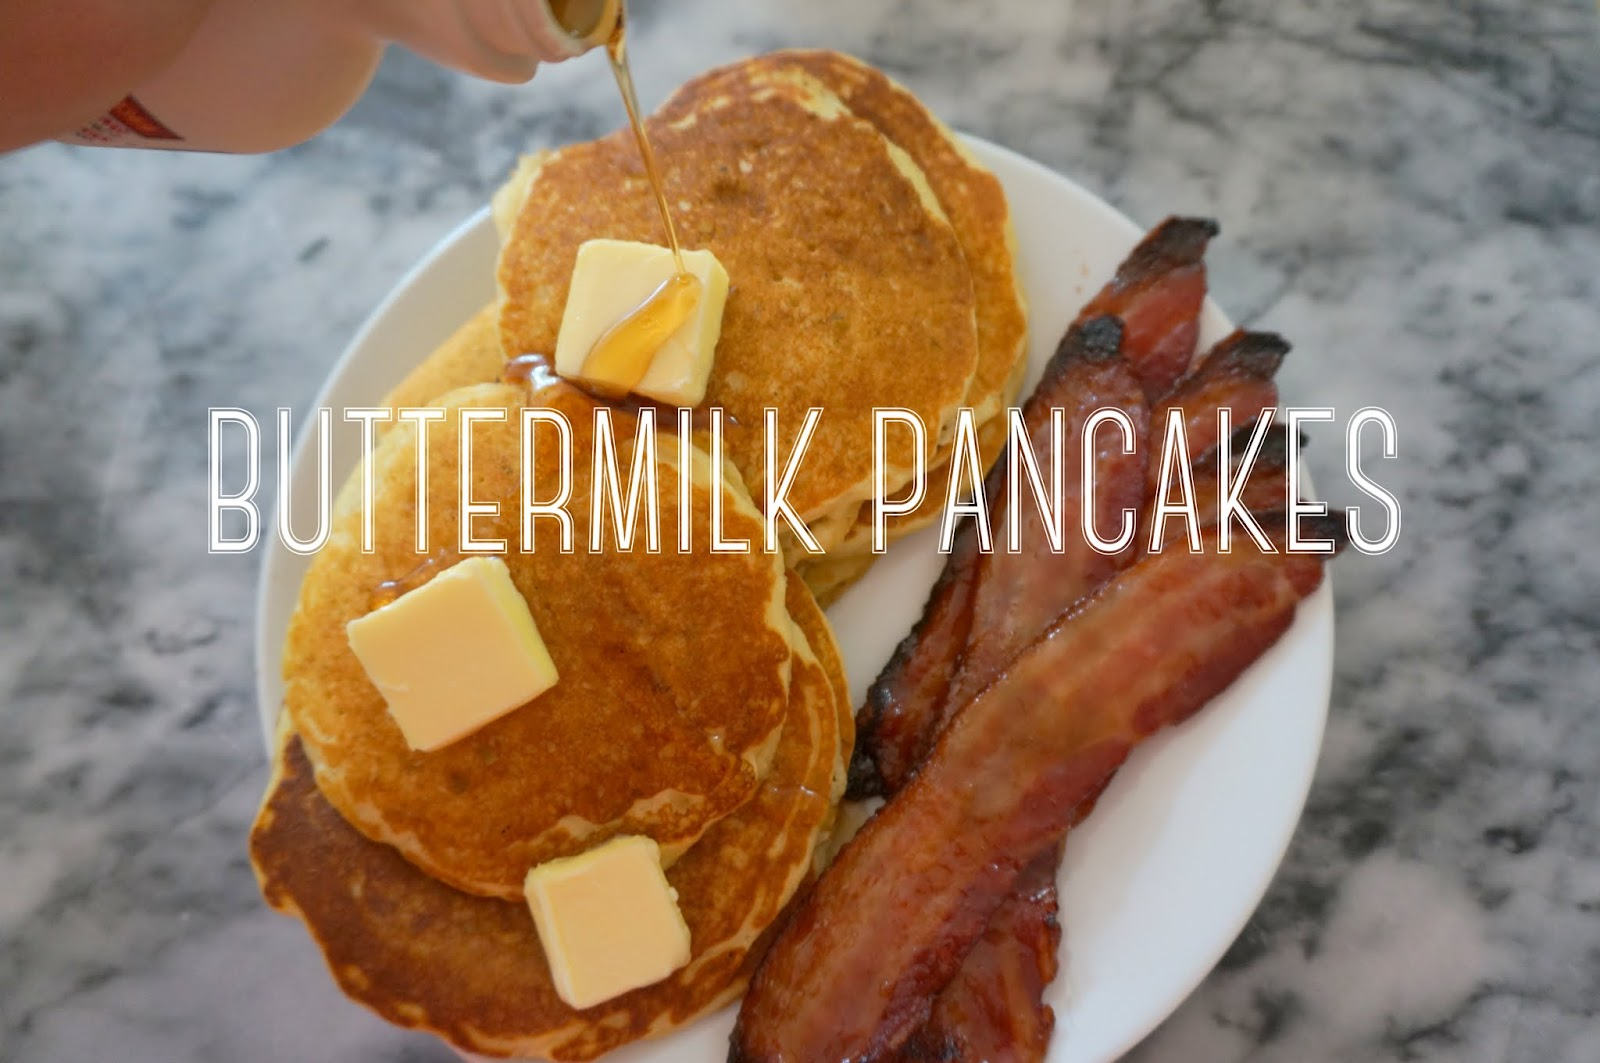 Buttermilk Pancakes (2)